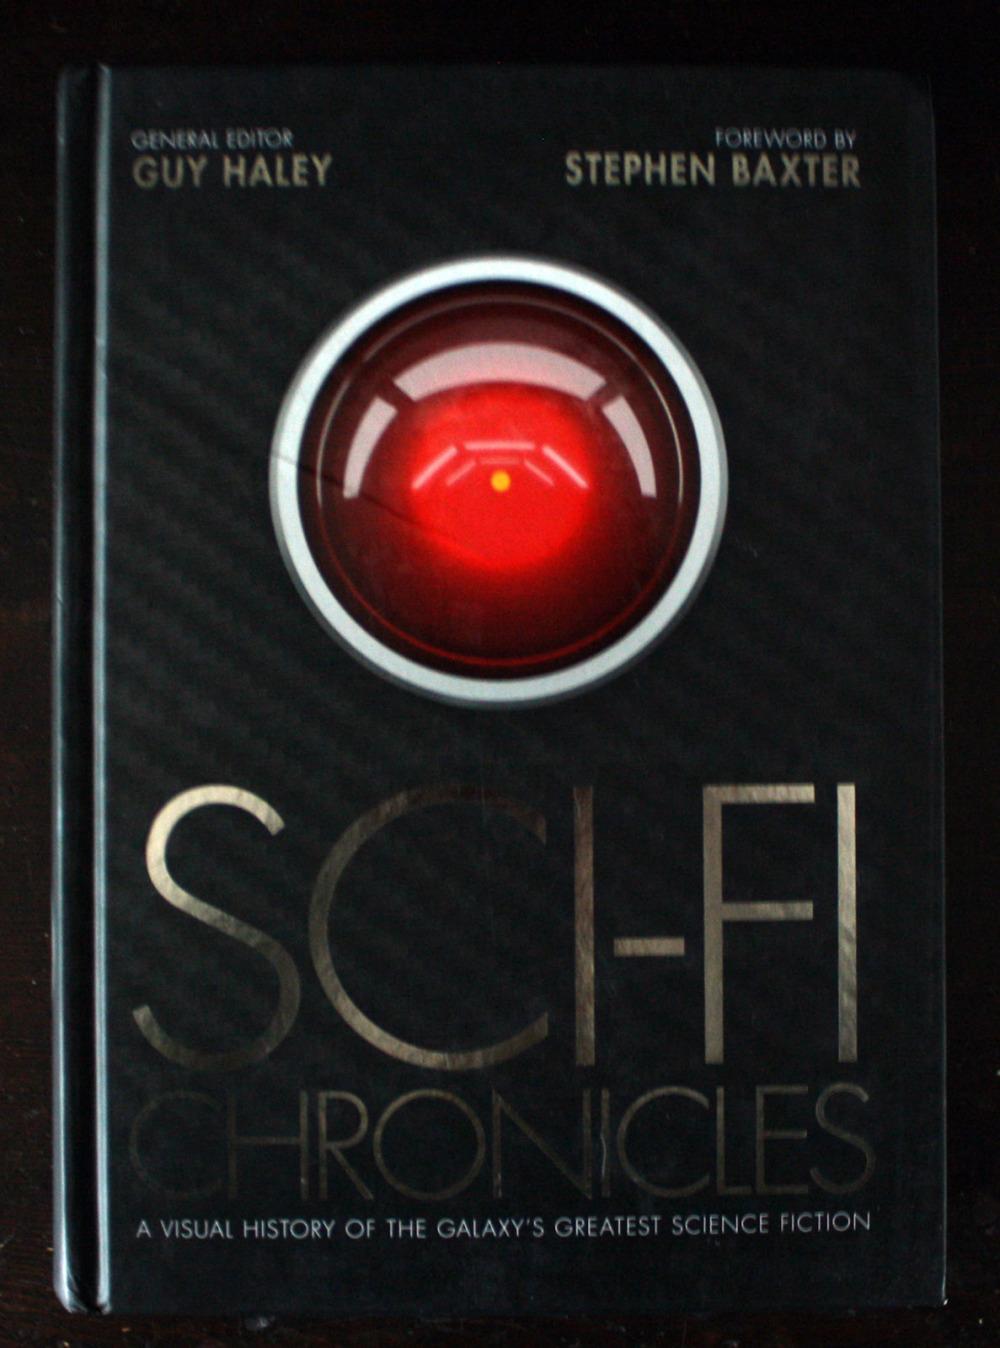 Fraai boek - Sci-Fi Chronicles